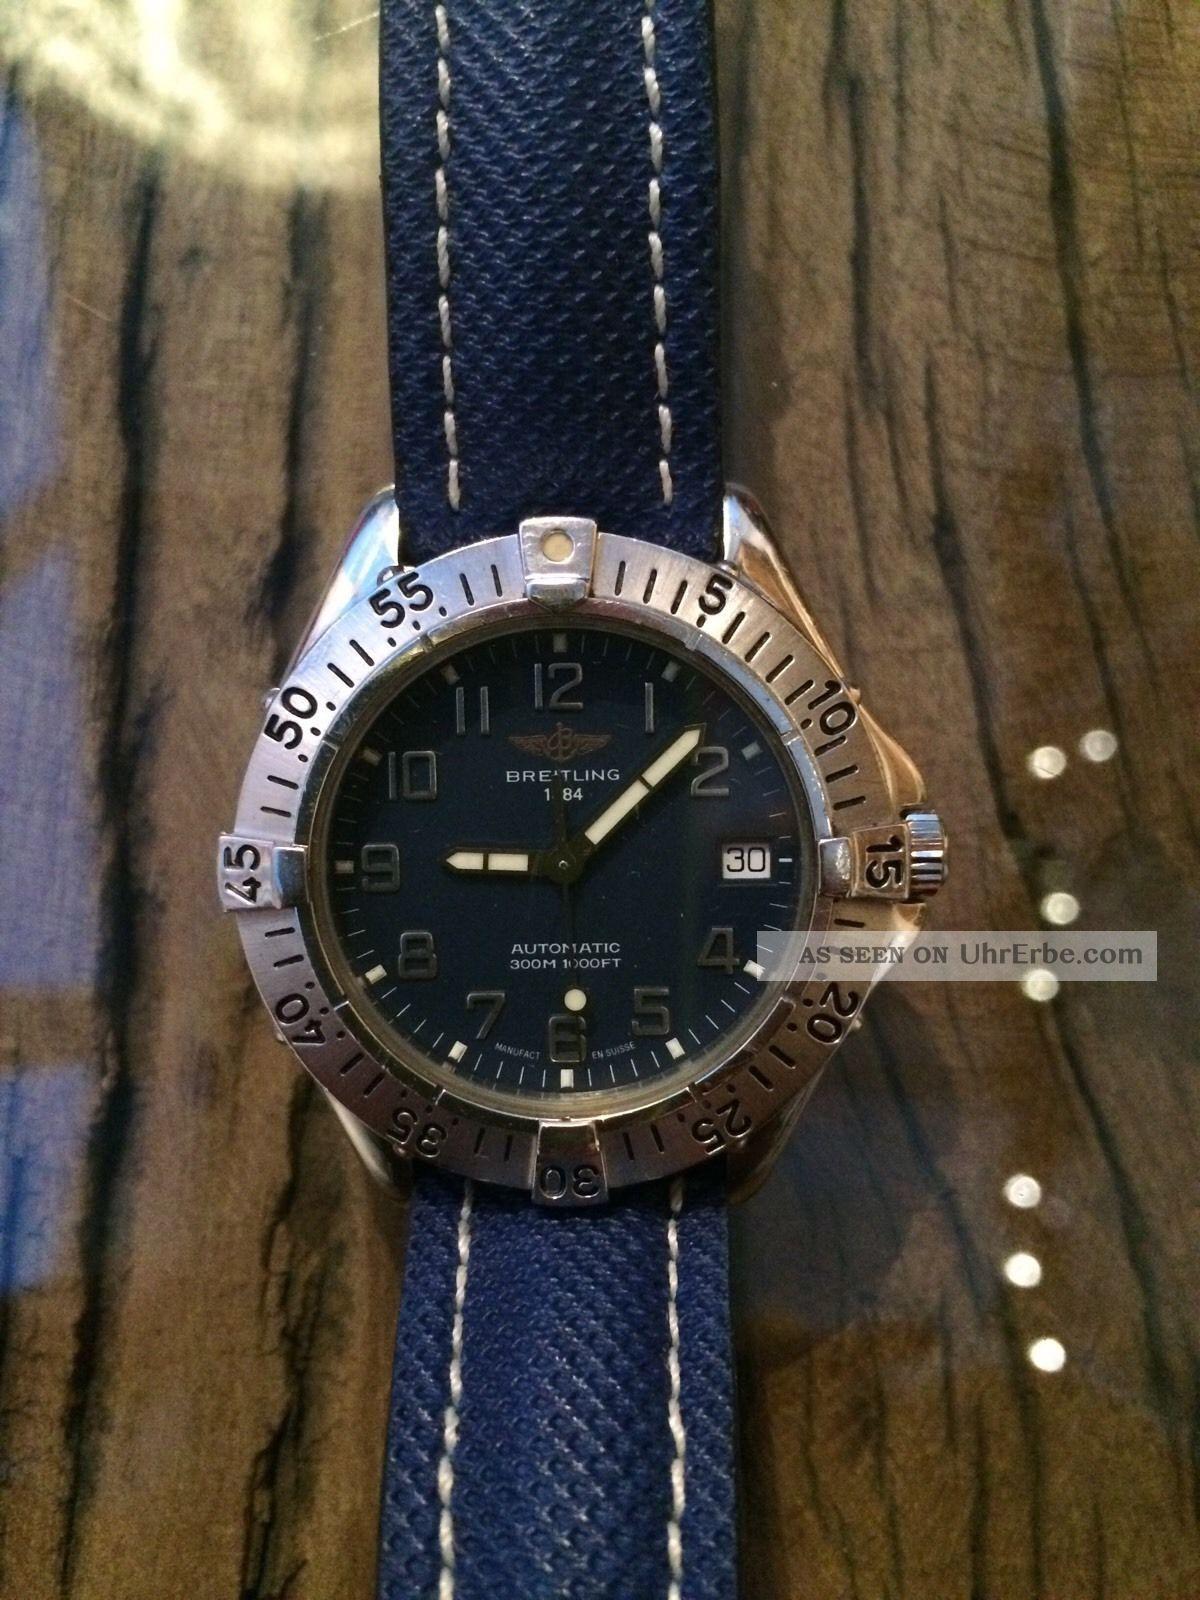 Breitling Colt Automatik Ll Herren Uhr 37mm Stahl/stahl Blau Armbanduhren Bild